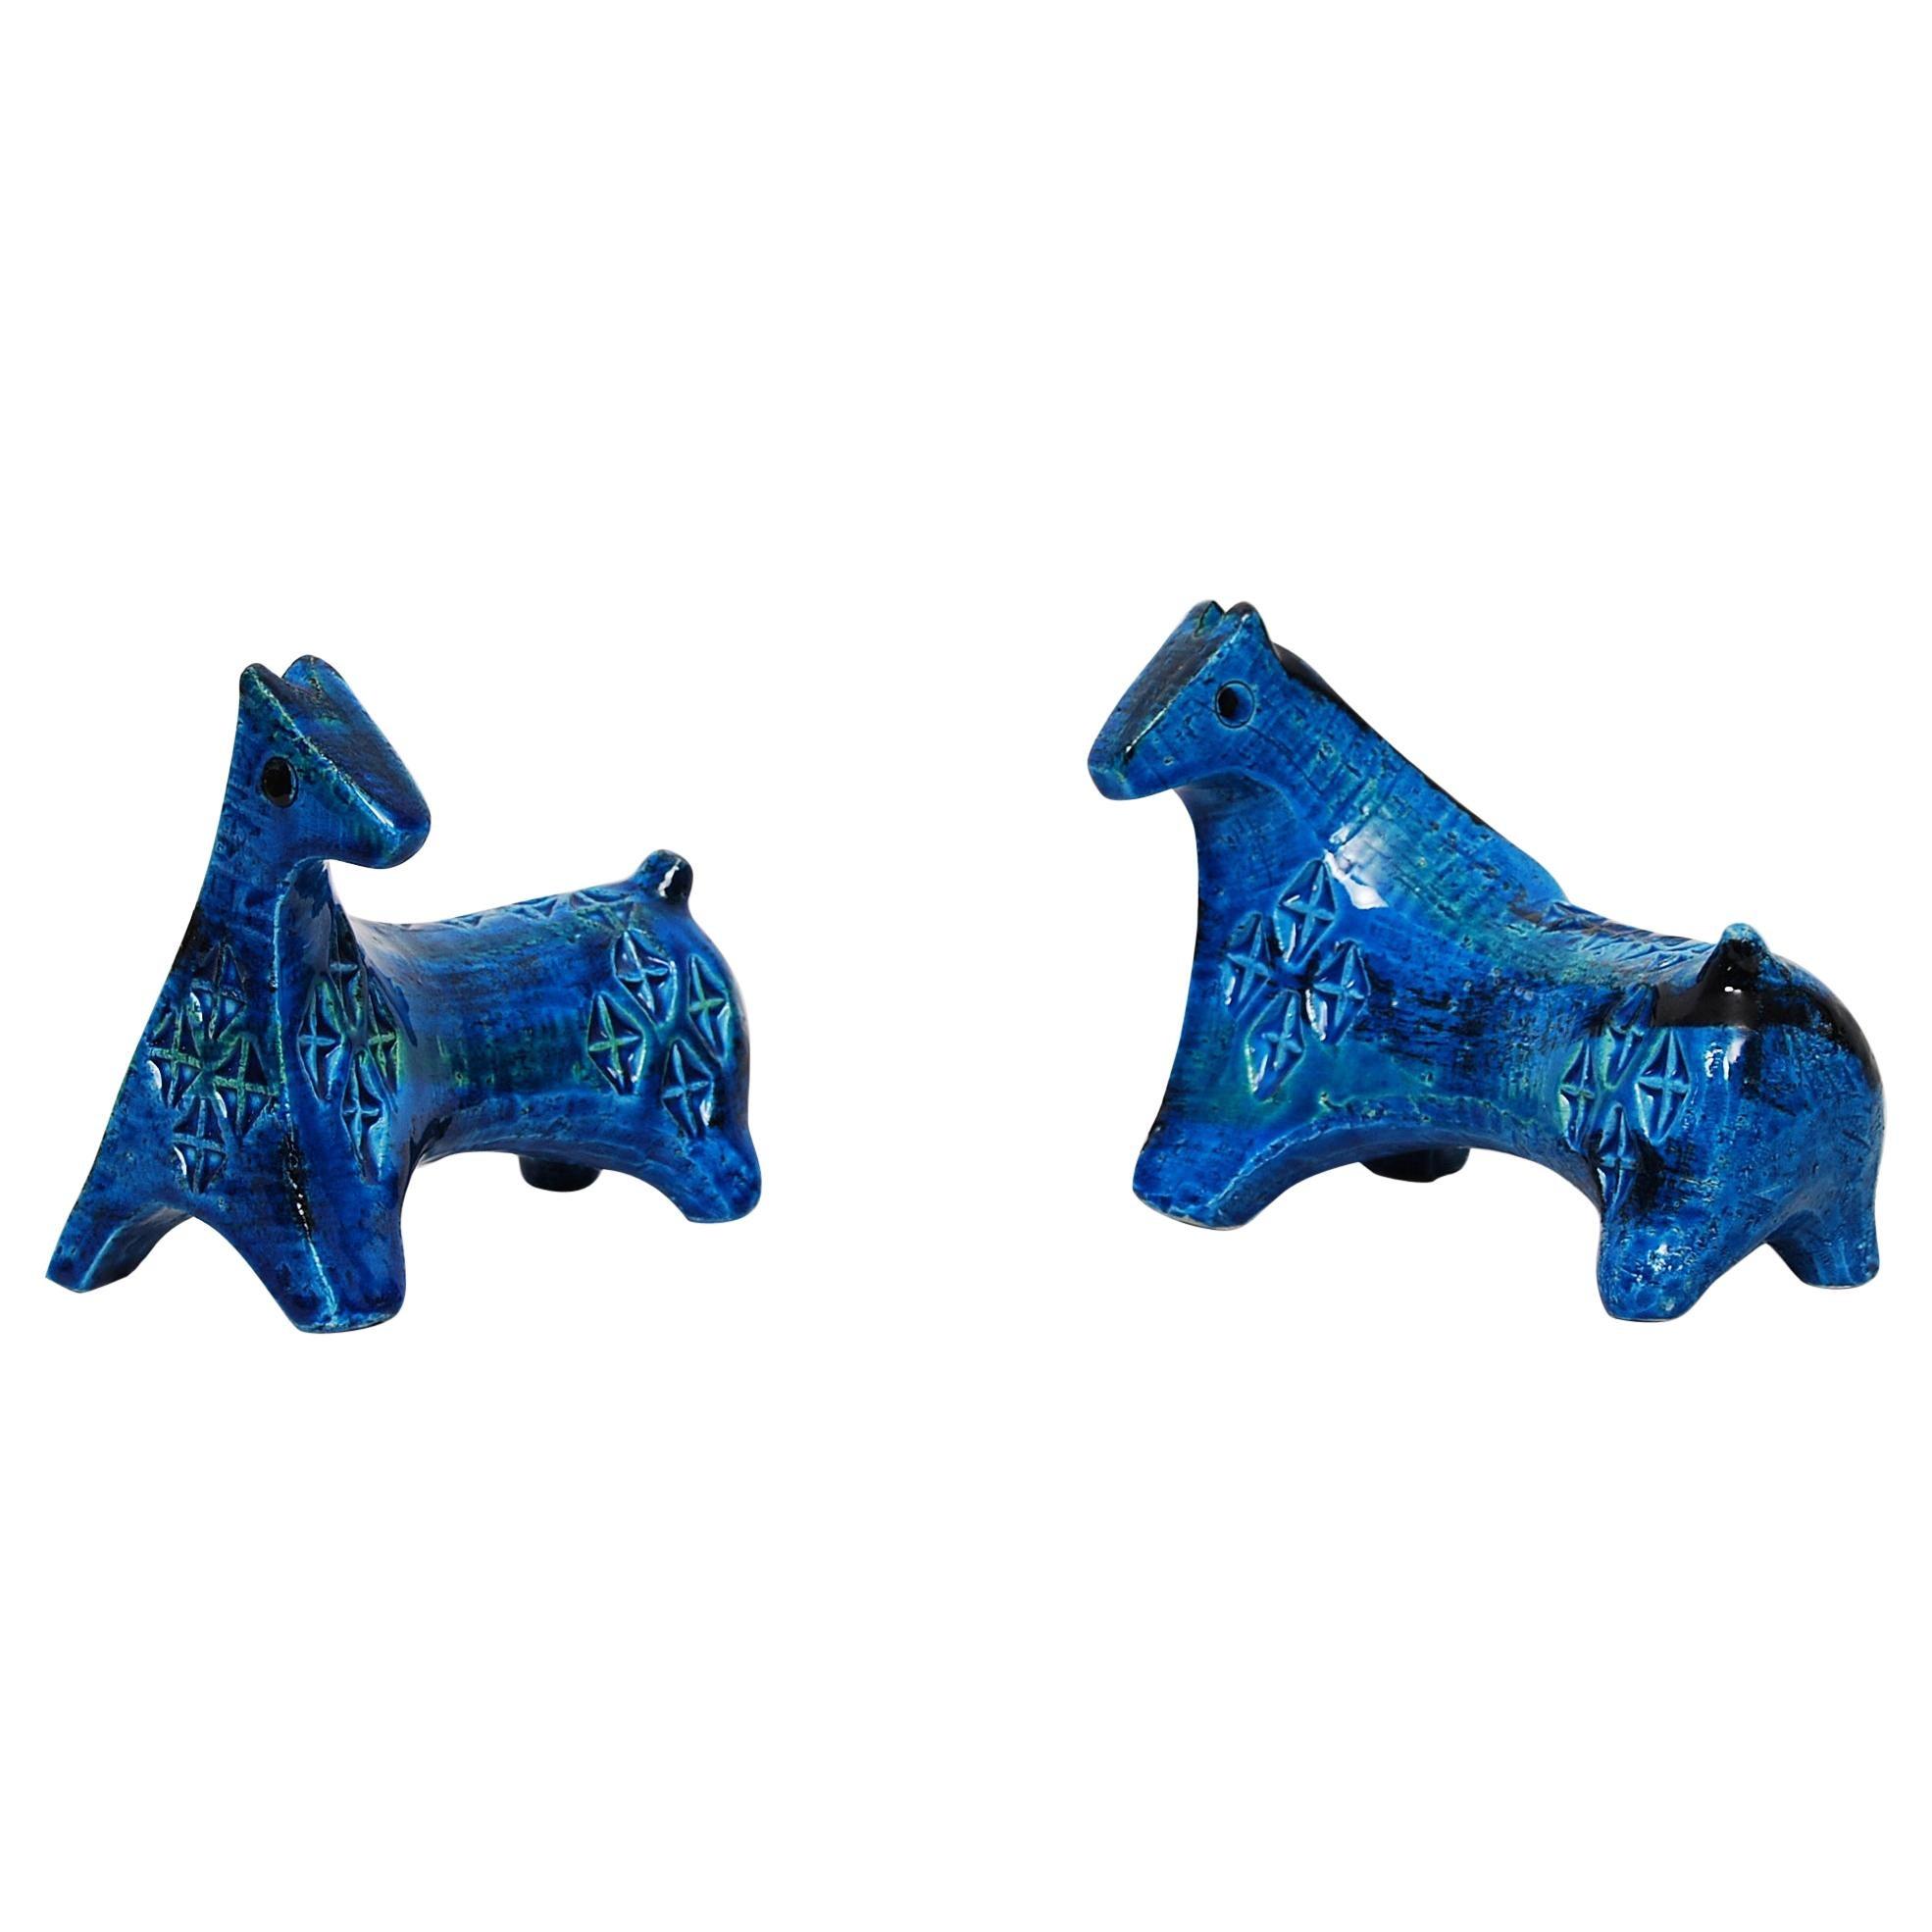 Early Pair of Bitossi Sculptural Horses in Rimini Blue Ceramic by Aldo Londi